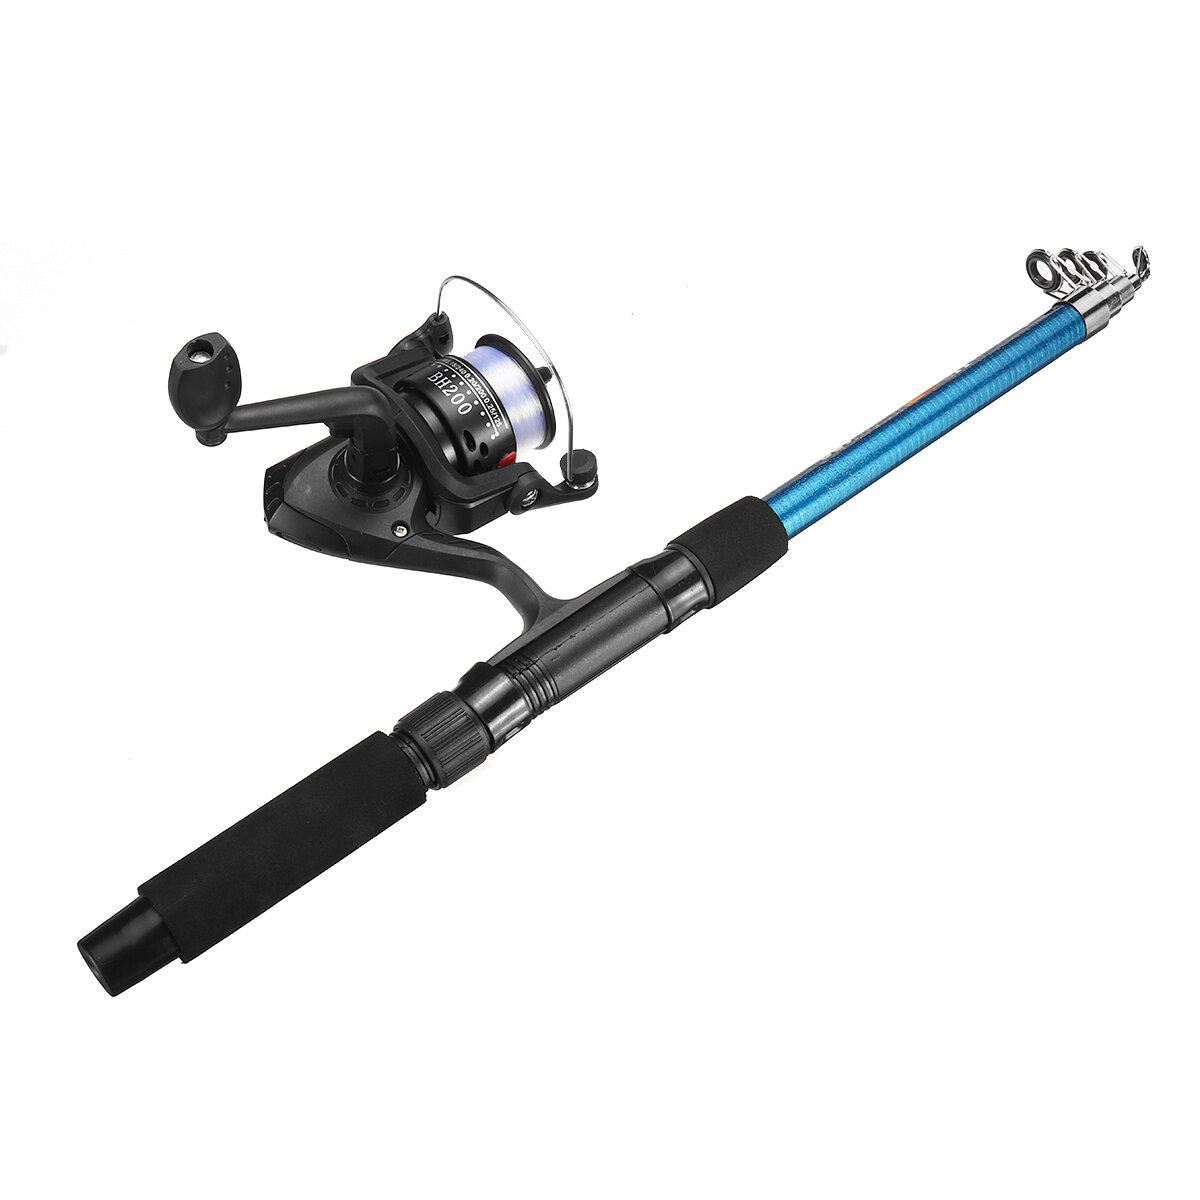 1.8M Folding Fishing Rod Set With Fishing Reel Telescopic Sea Fishing Rod Spinning Glass Fiber Ultralight Hard Fishing R